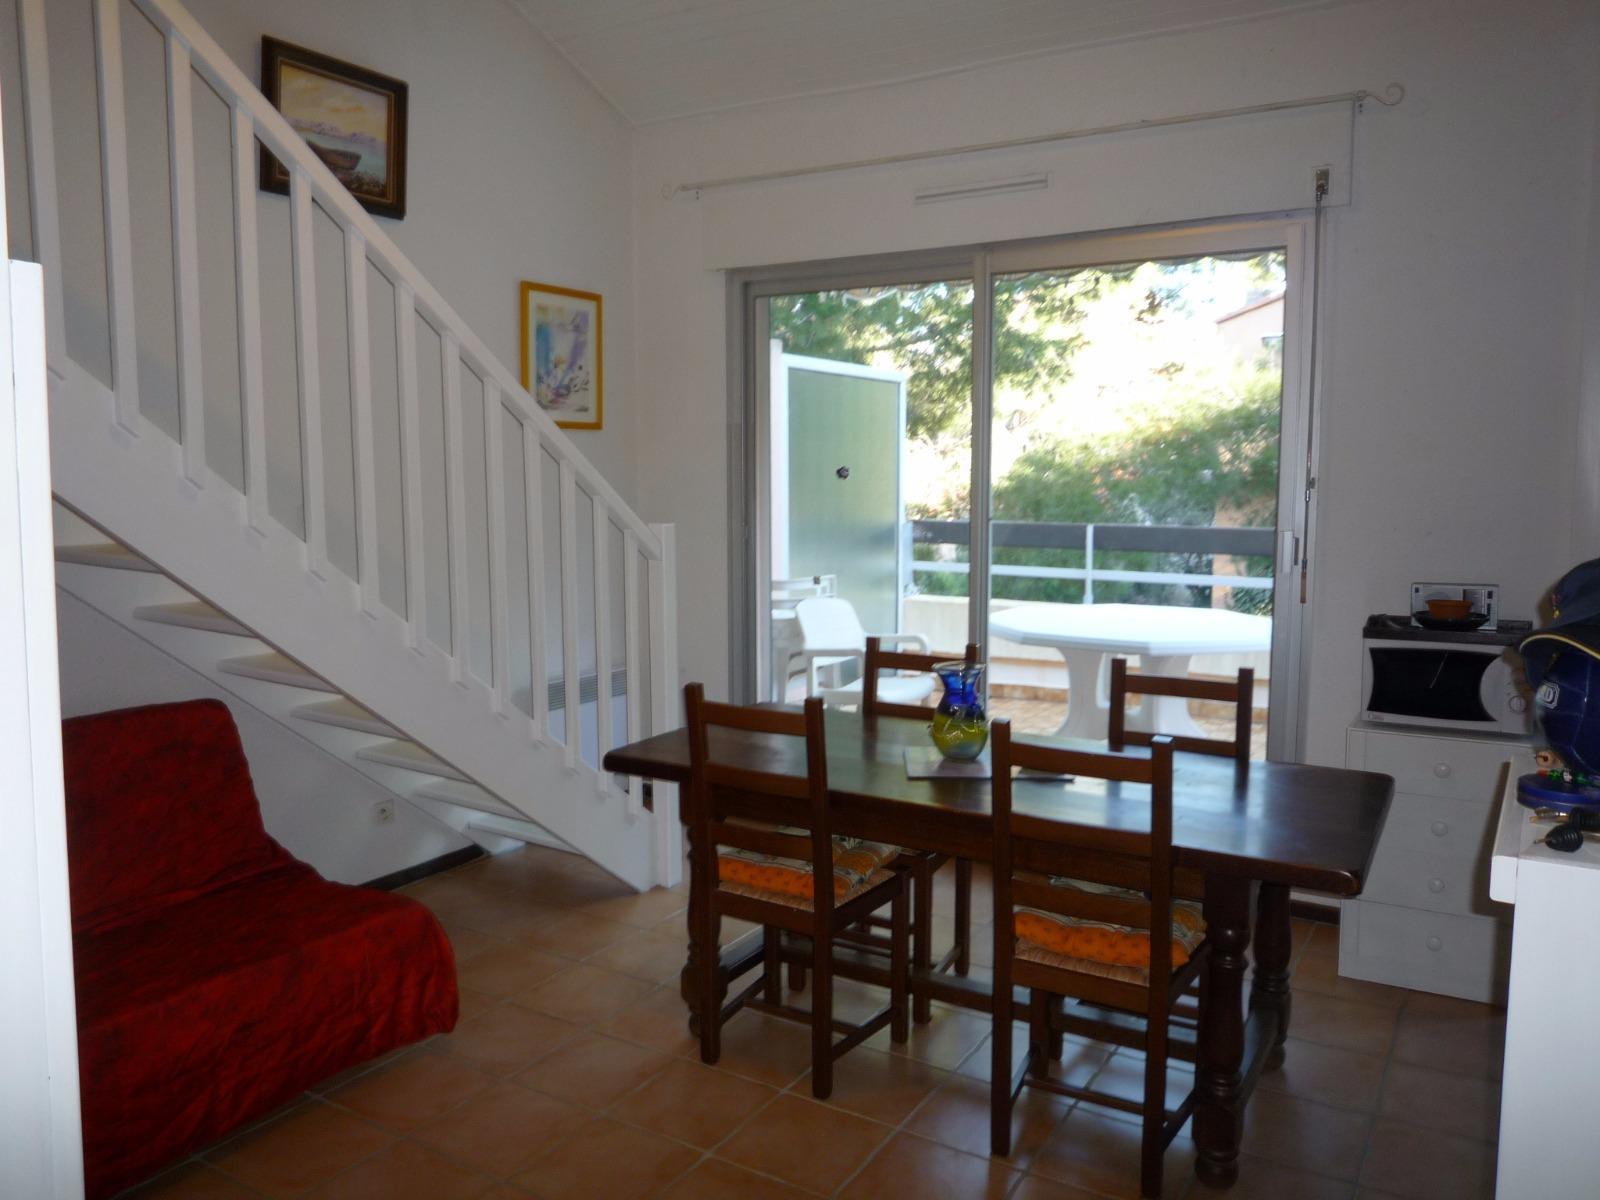 Vente Appartement 2 Pi Ces En Duplex Banyuls Sur Mer